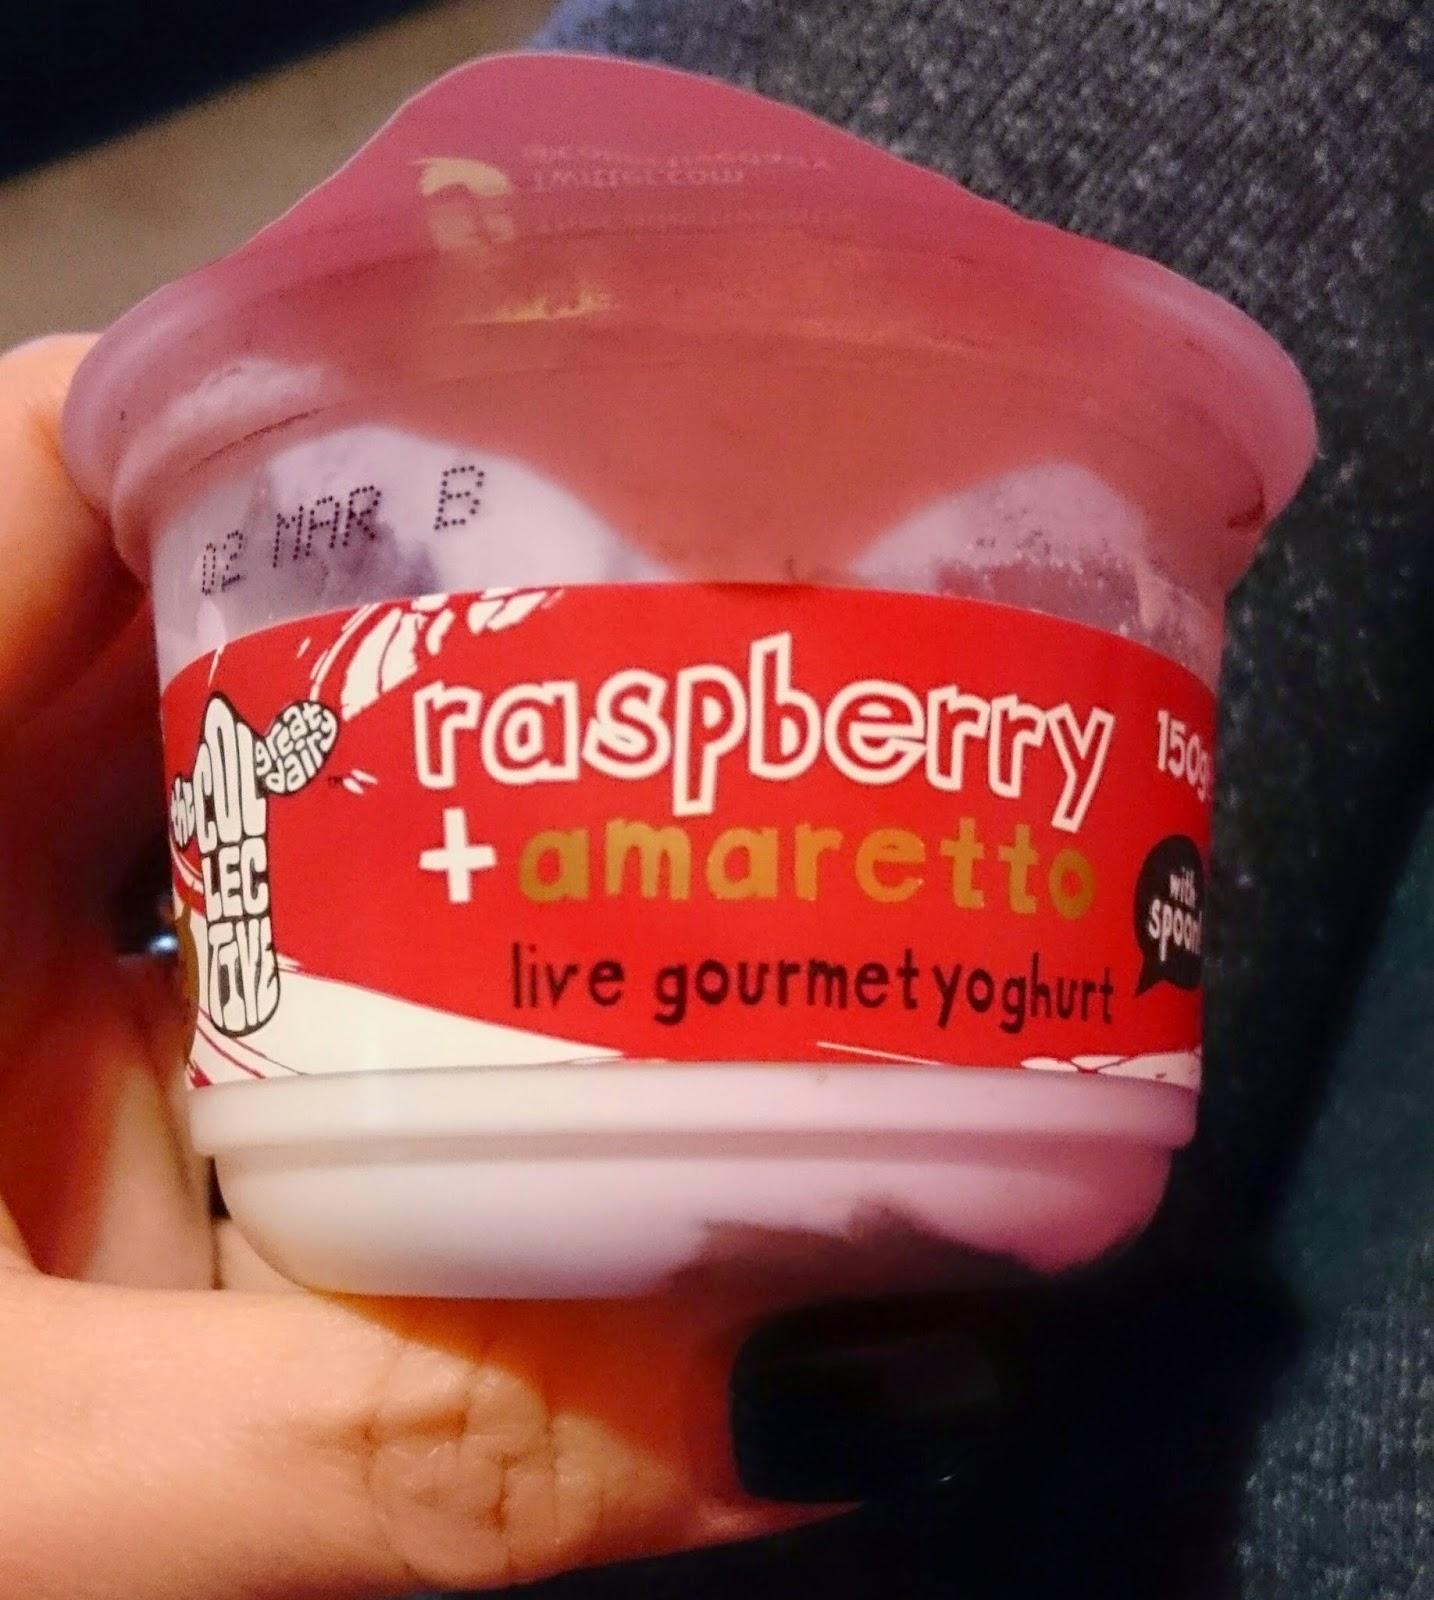 The Collective Diary Raspberry & Amaretto Yogurt